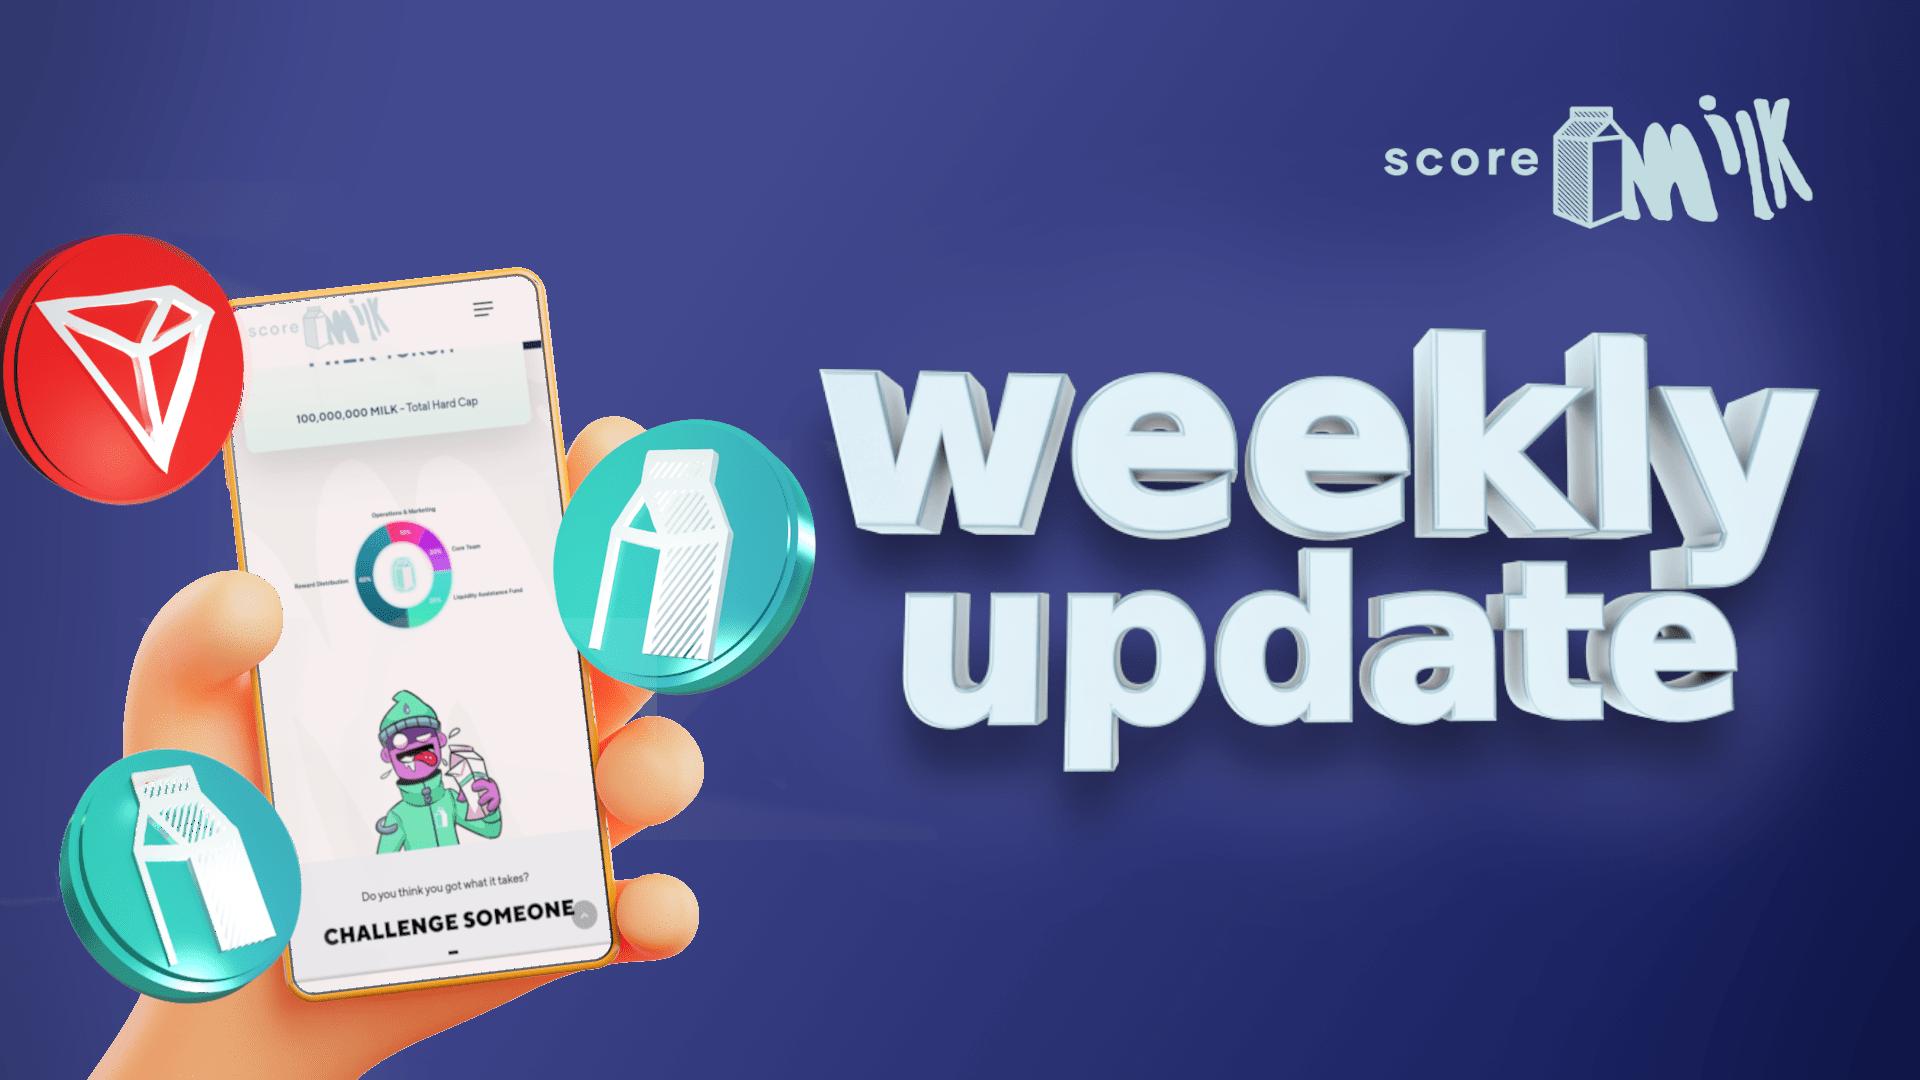 Score Milk Update, August 1, 2021